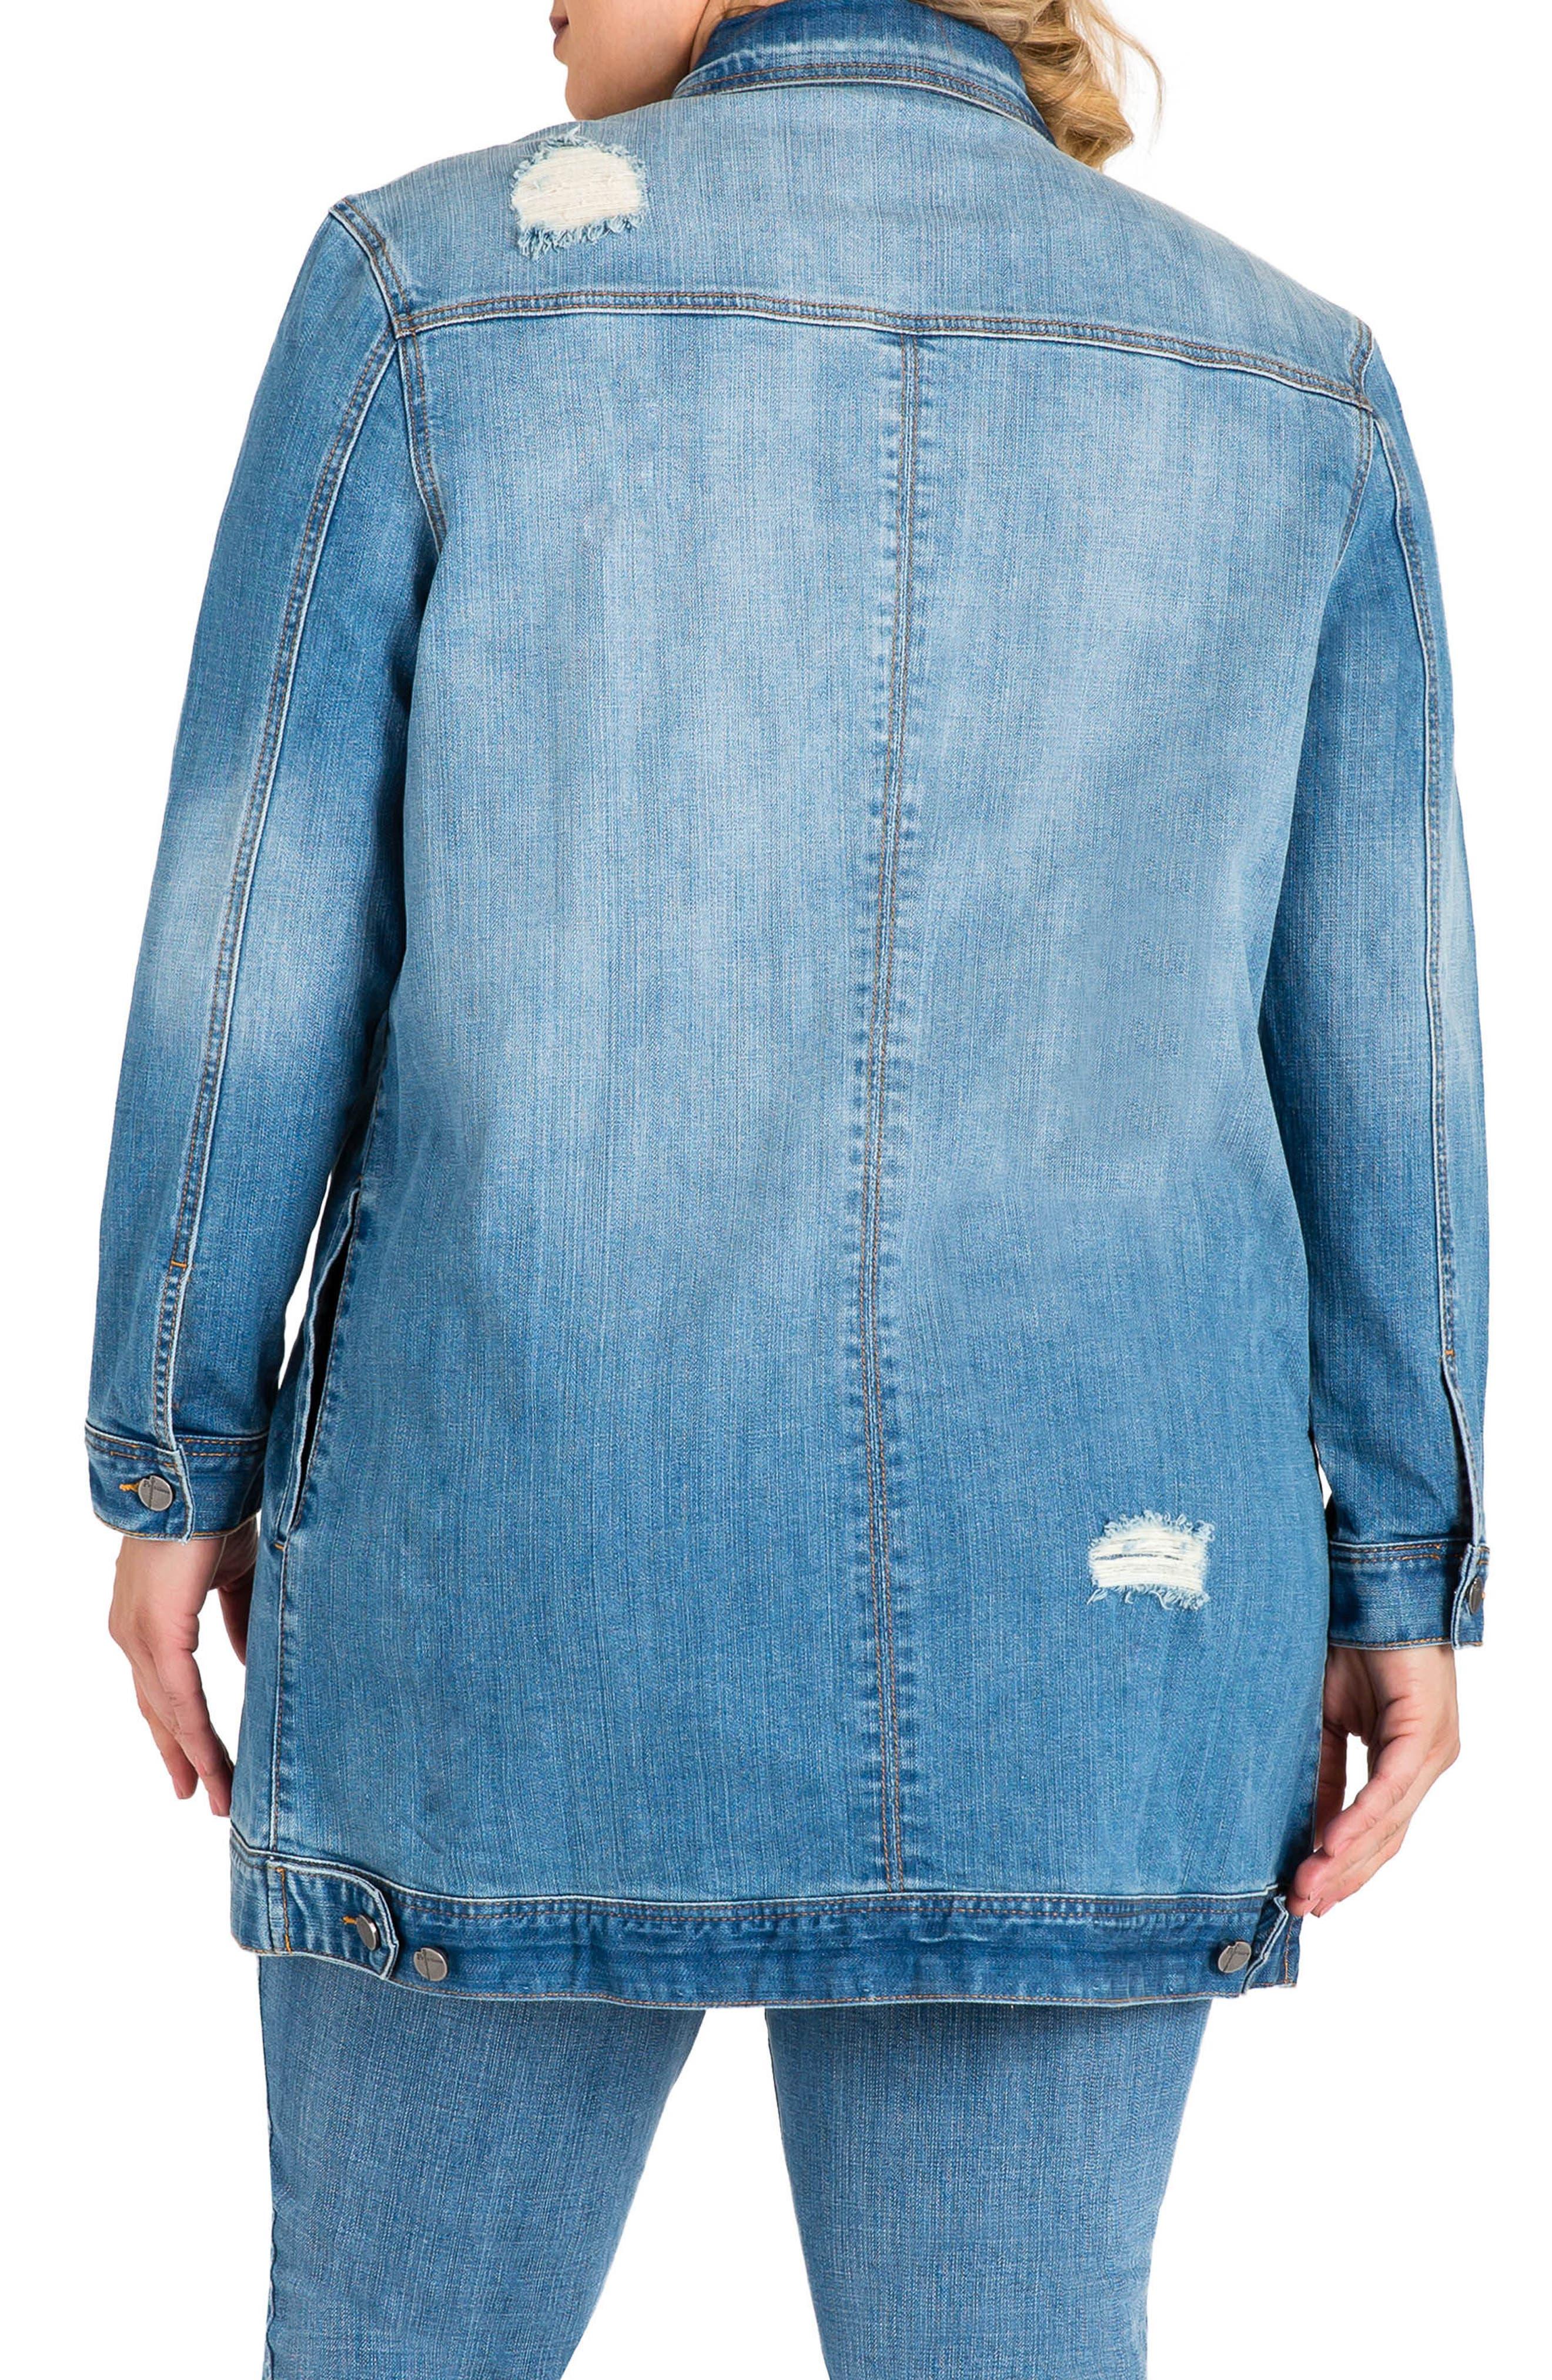 STANDARDS & PRACTICES, Margot Longline Denim Jacket, Alternate thumbnail 2, color, LIGHT BLUE